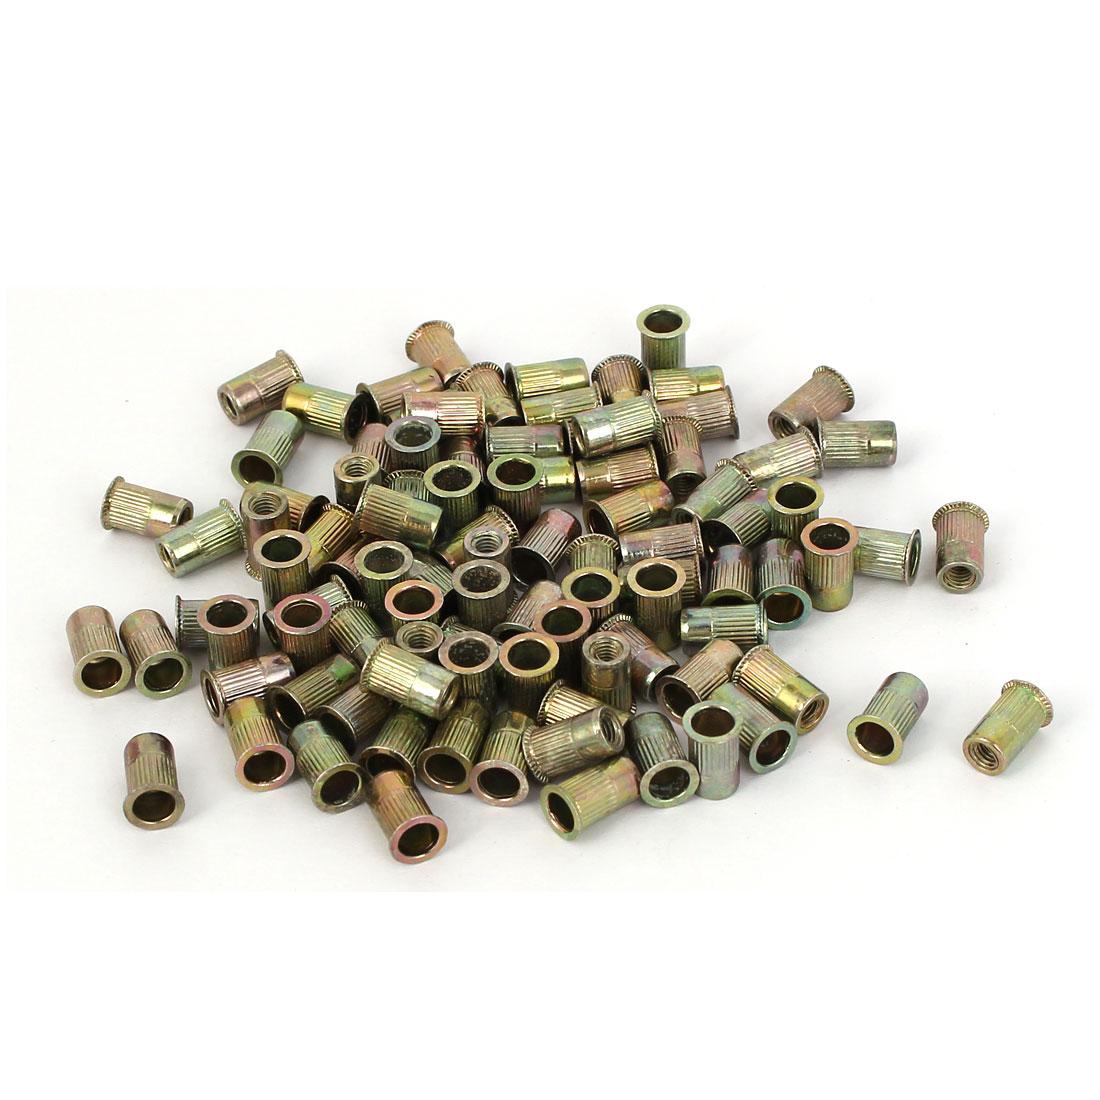 M3 Carbon Steel Knurled Insert Rivet Nut Nutserts Fastener Bronze Tone 100pcs